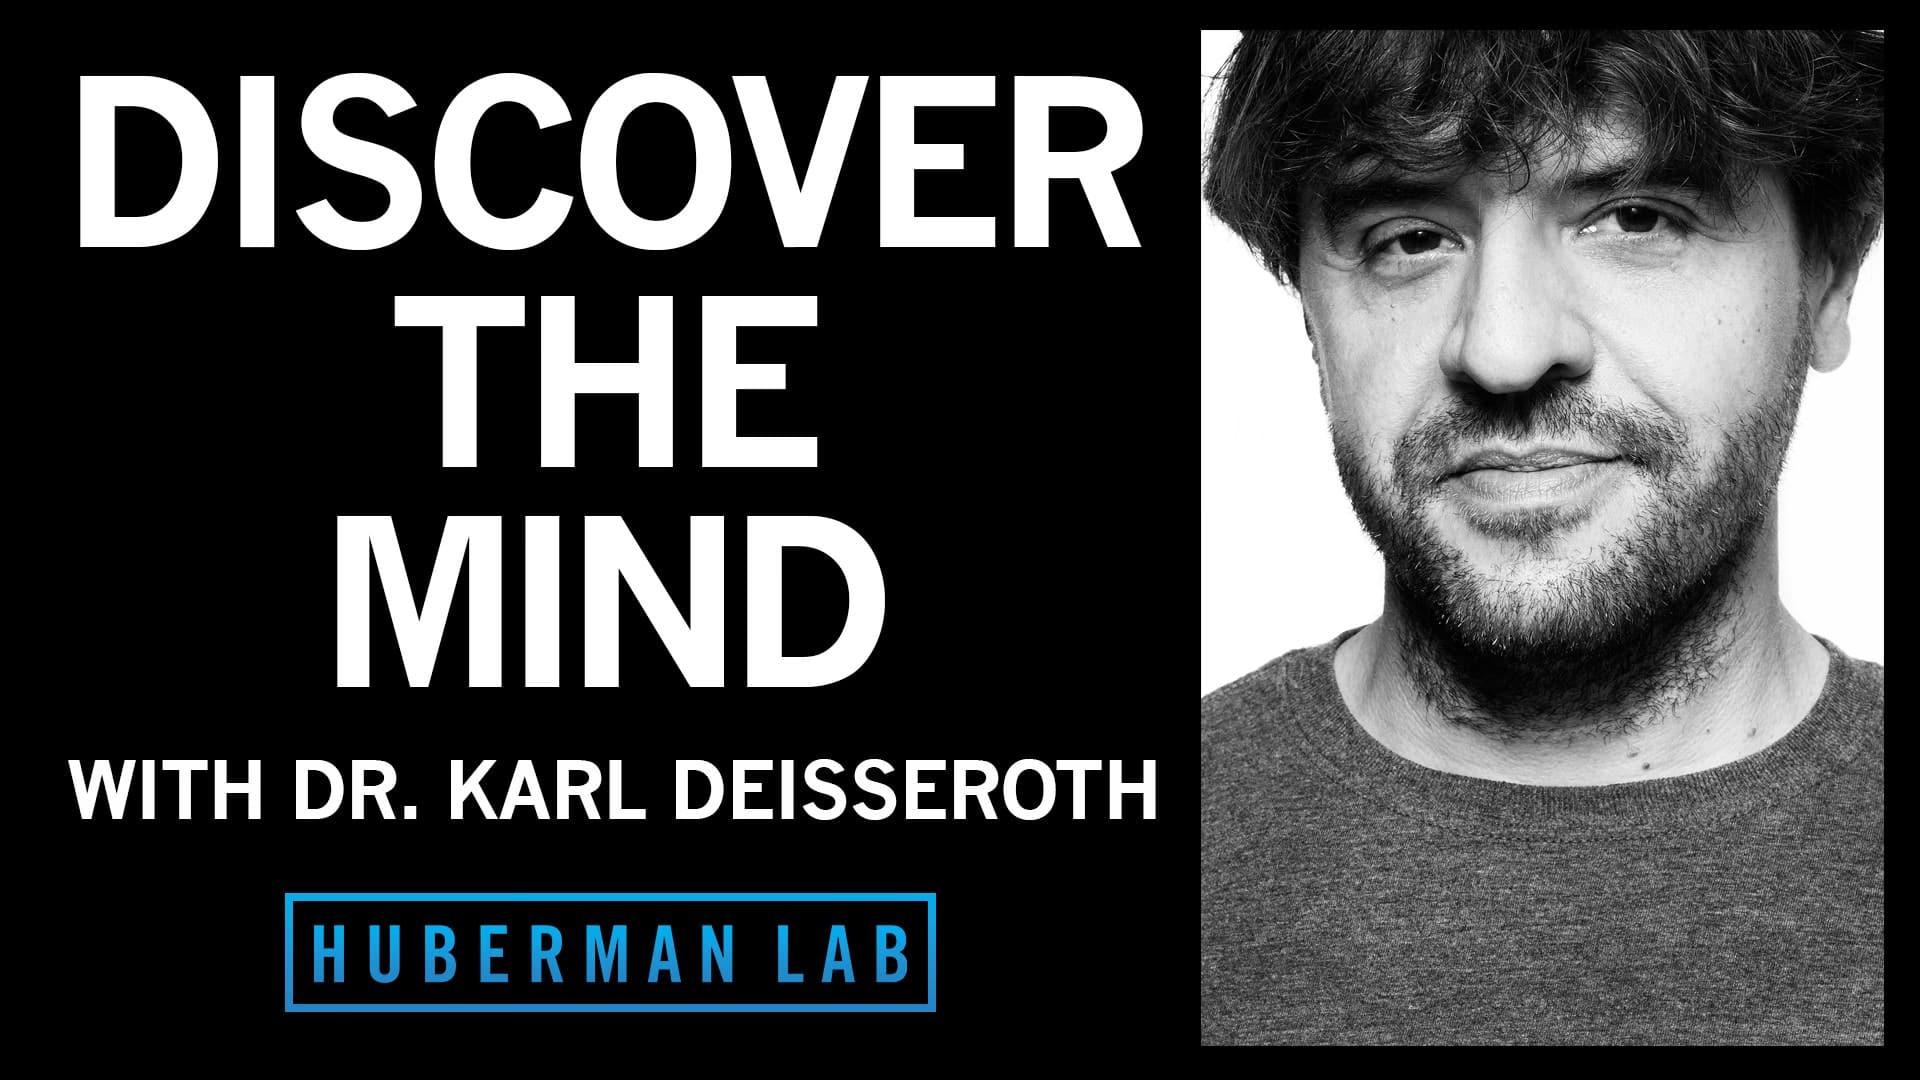 Huberman Lab Podcast Episode 26 Title Card